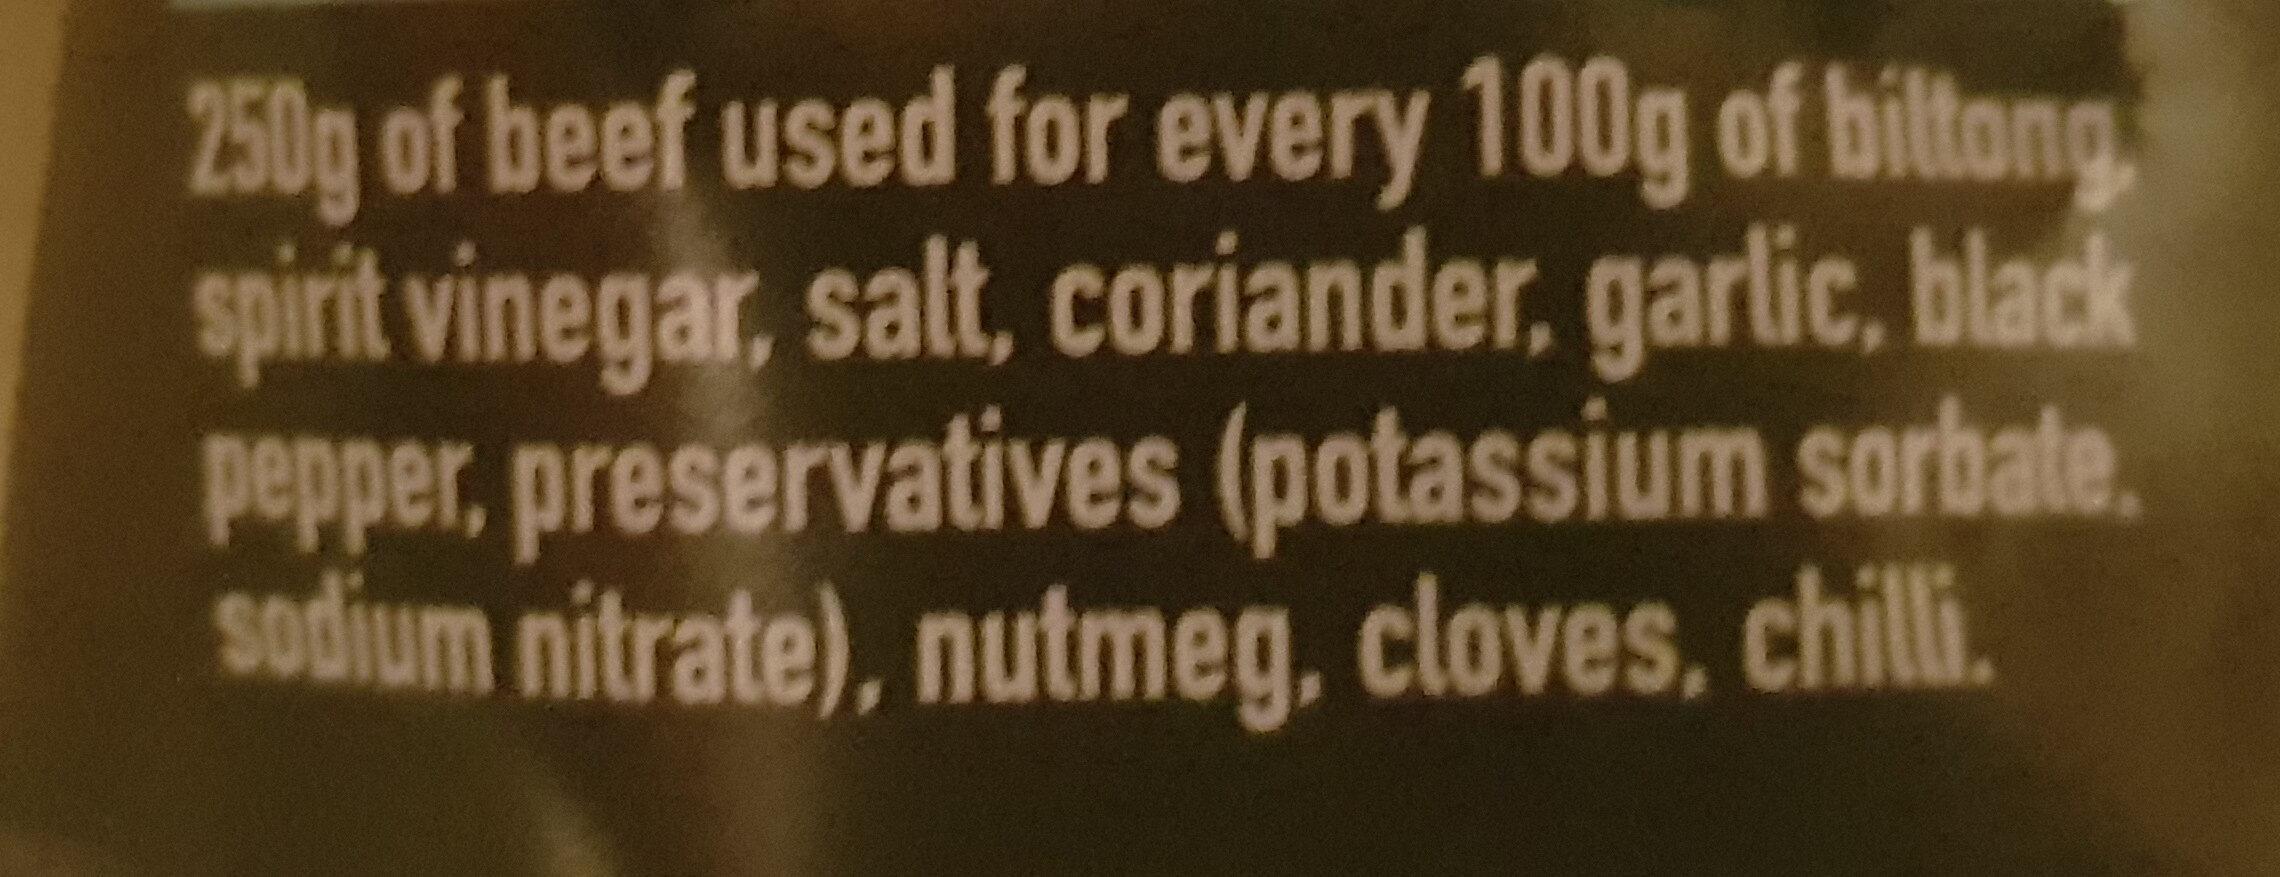 Biltong - Ingredients